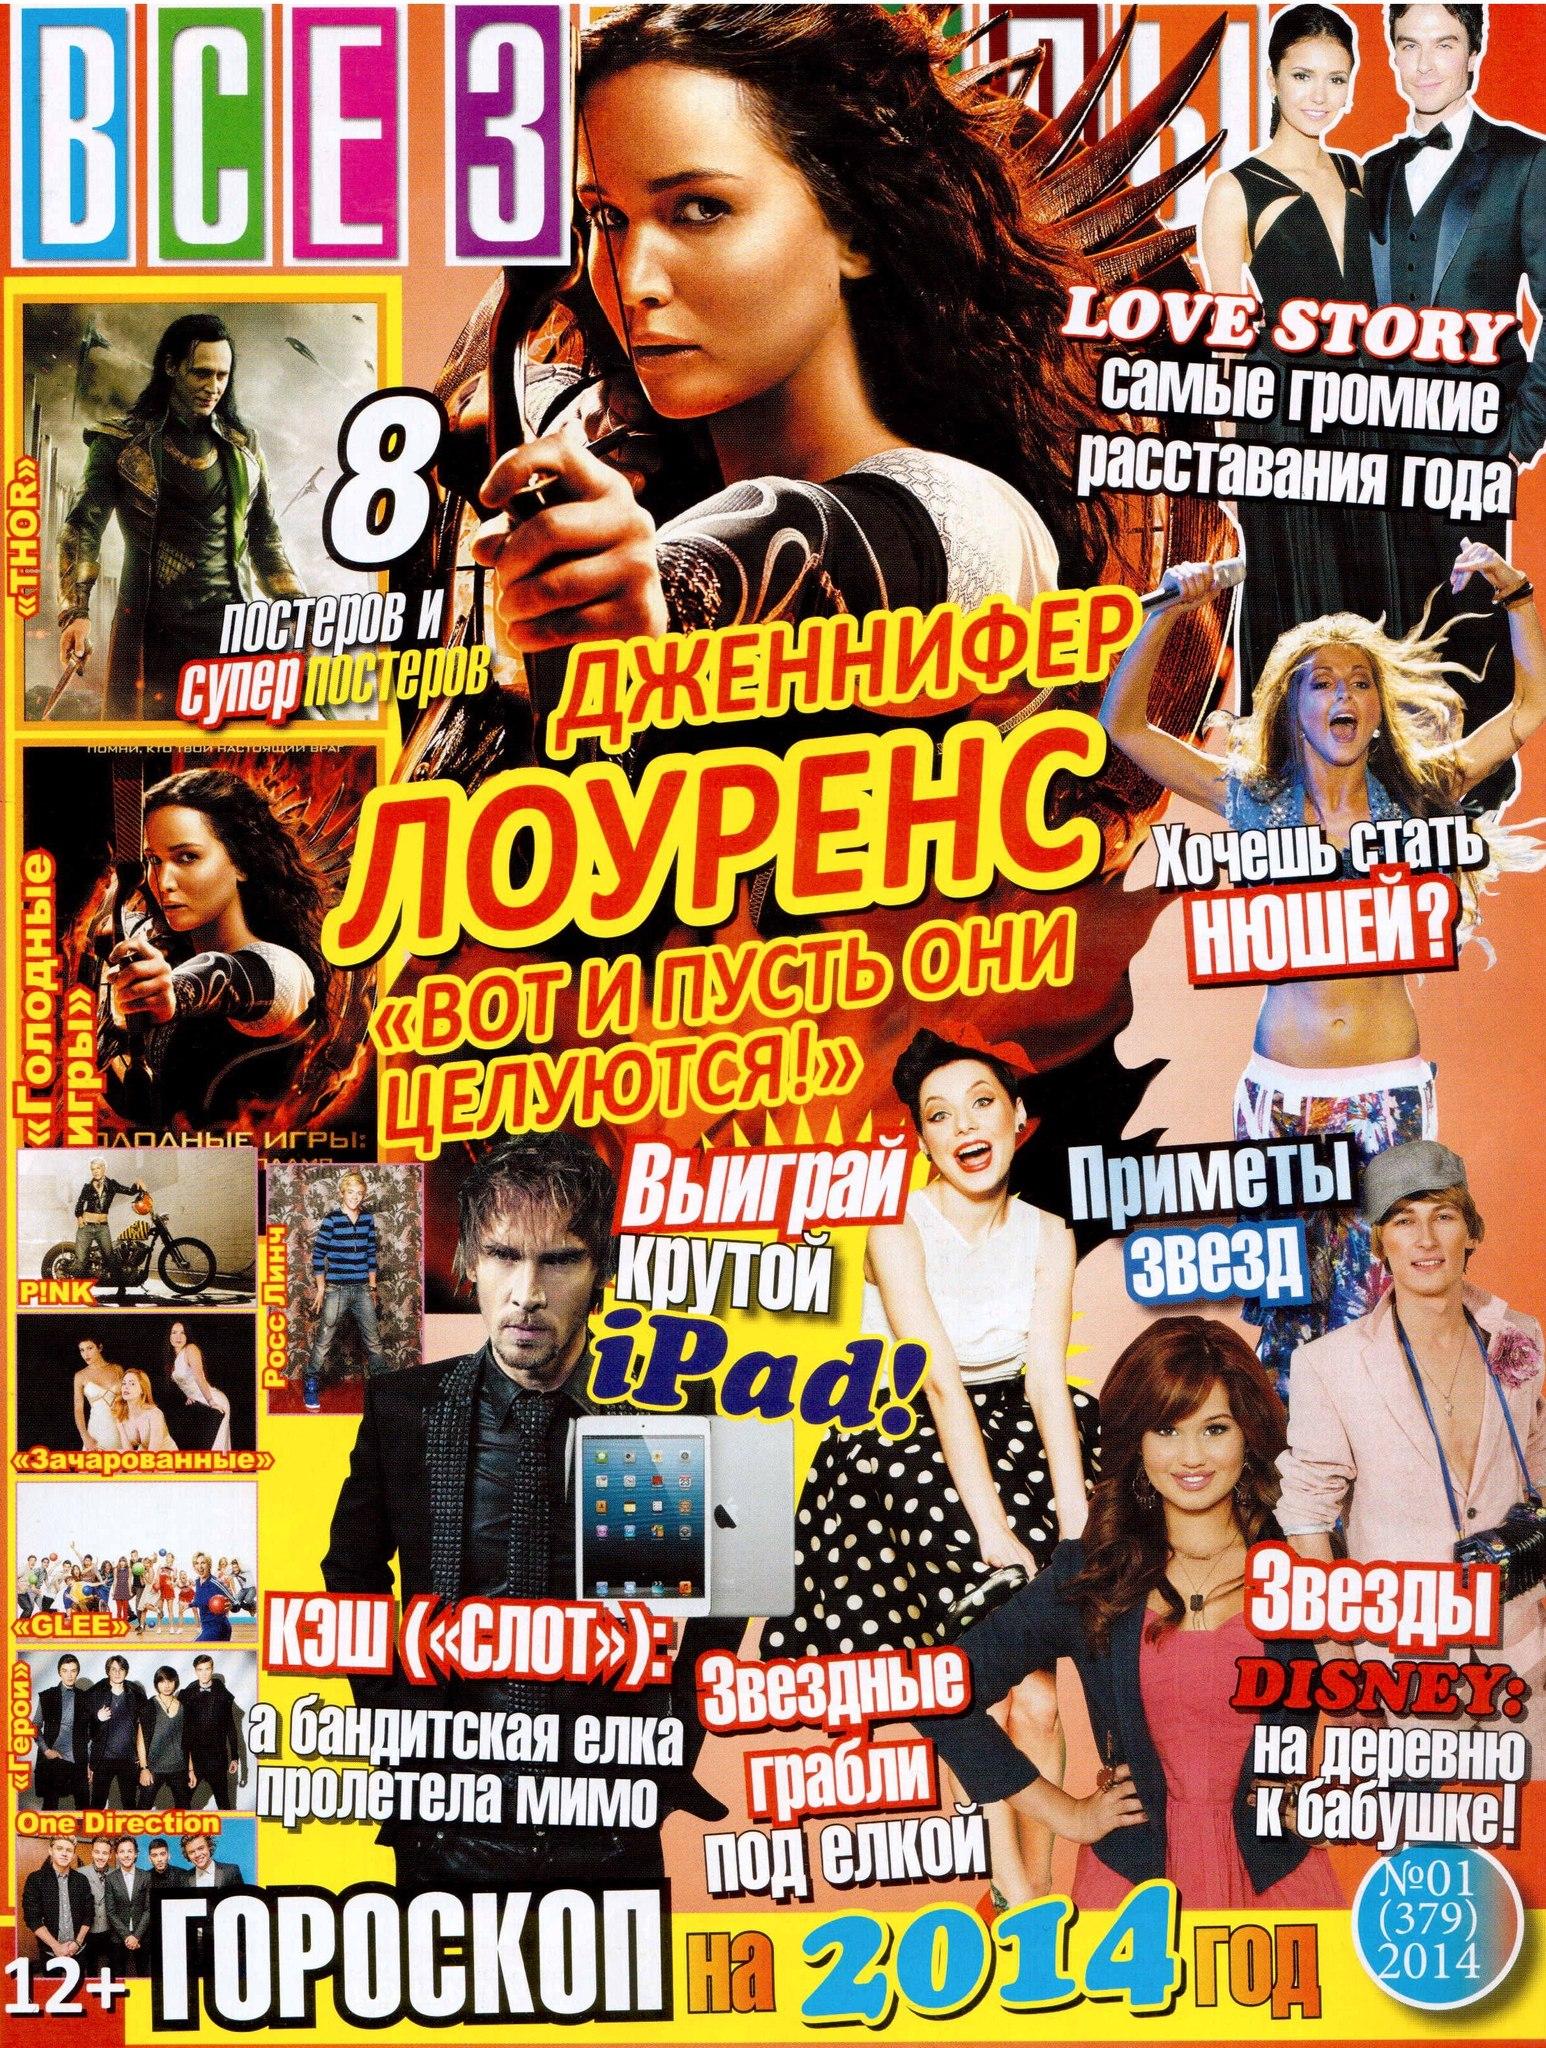 карнавалу журнал популярный благодаря постерам звезд стиле